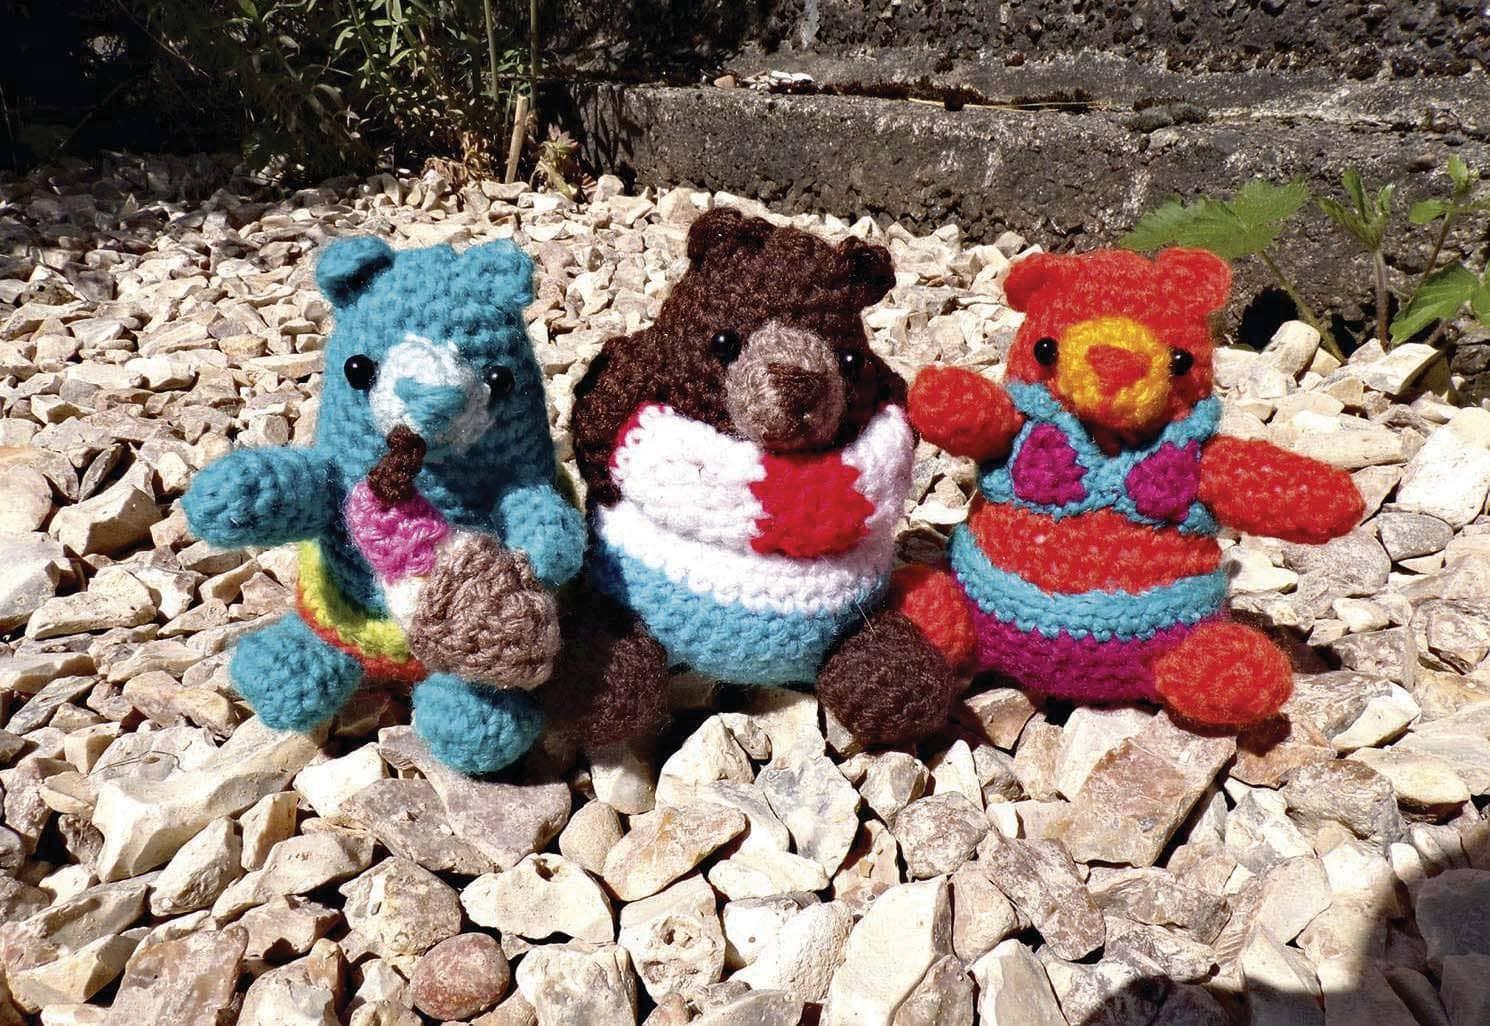 Immersed in crochet